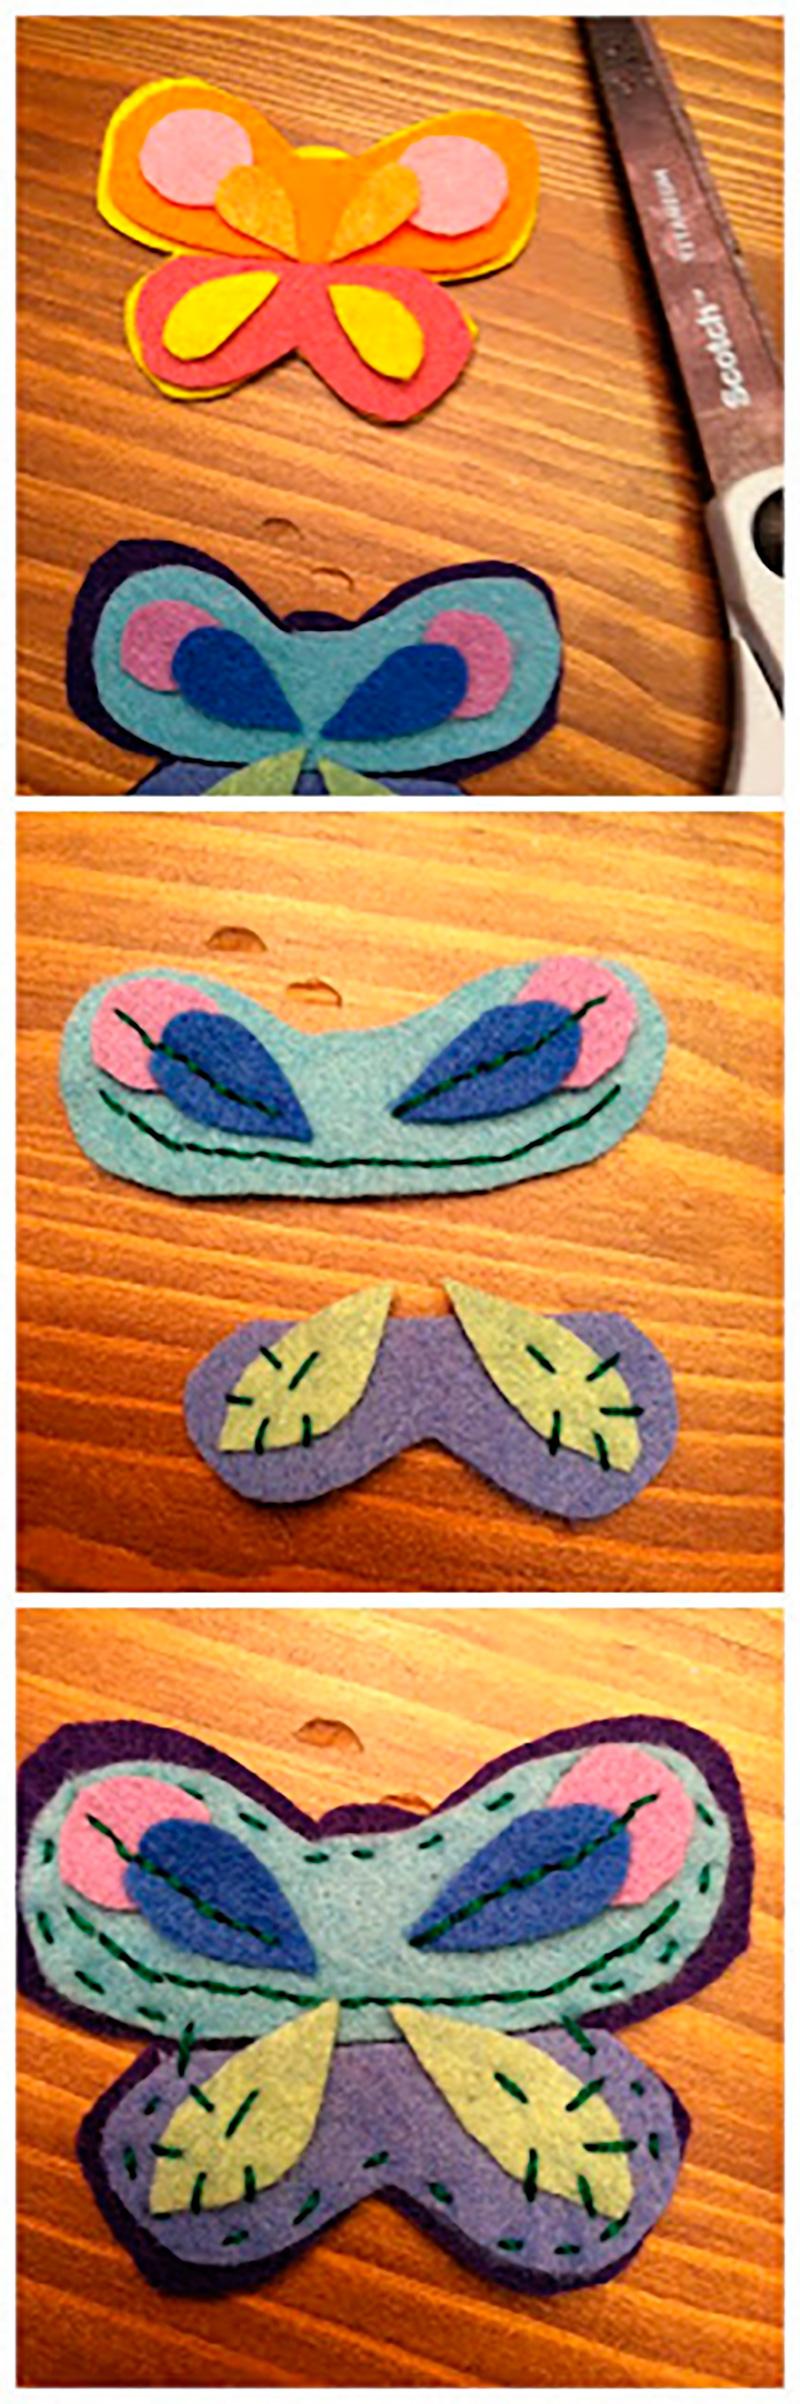 borboleta-de-feltro-e-botões